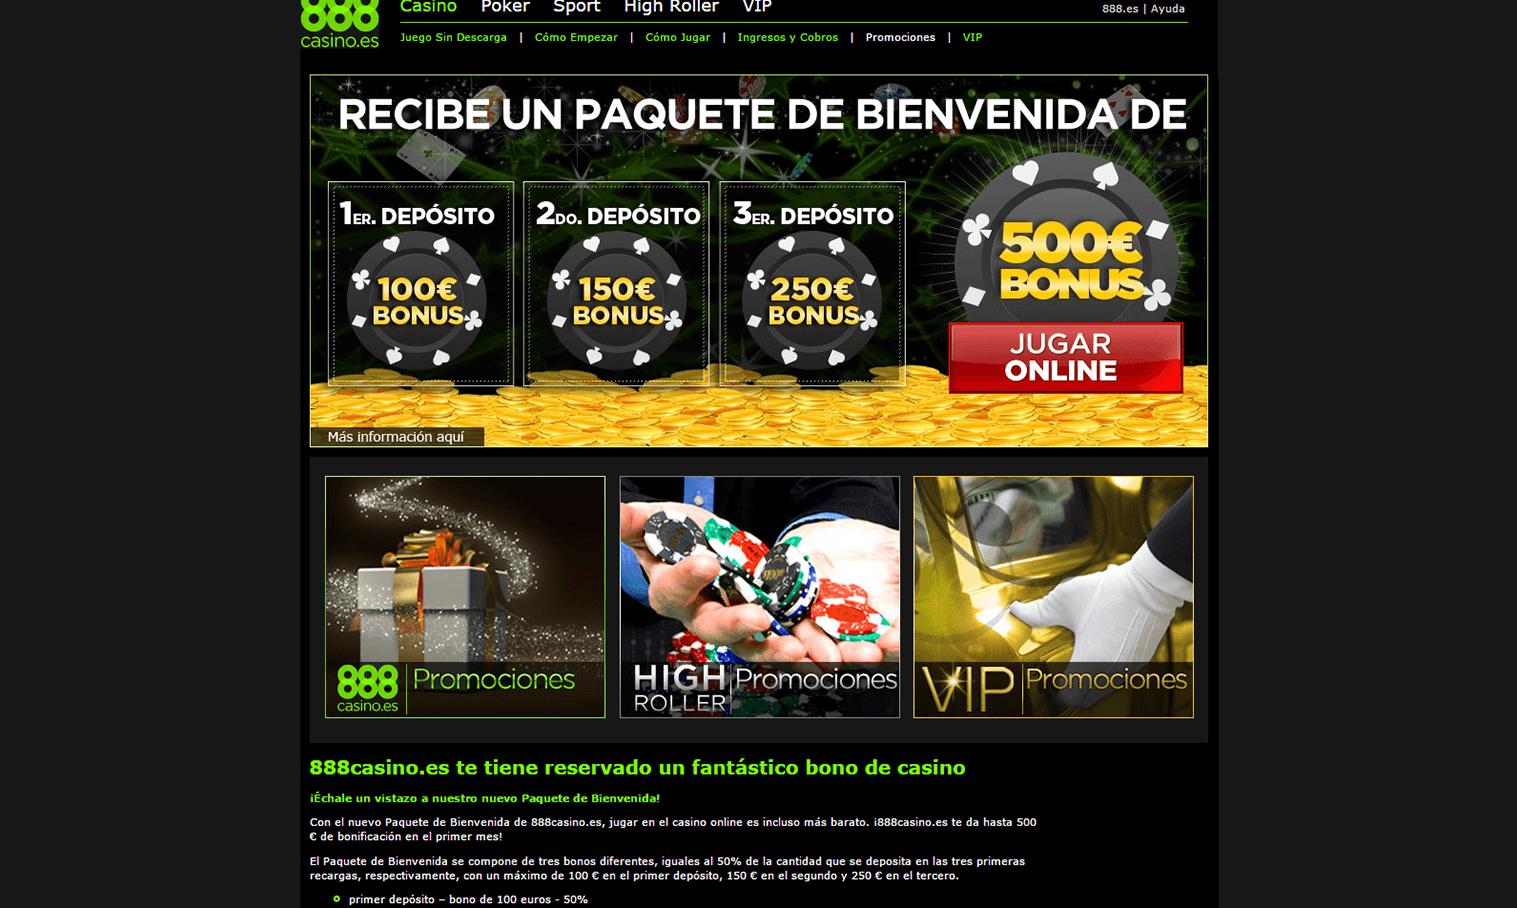 Jugar 888 casino bono bet365 Murcia - 76092